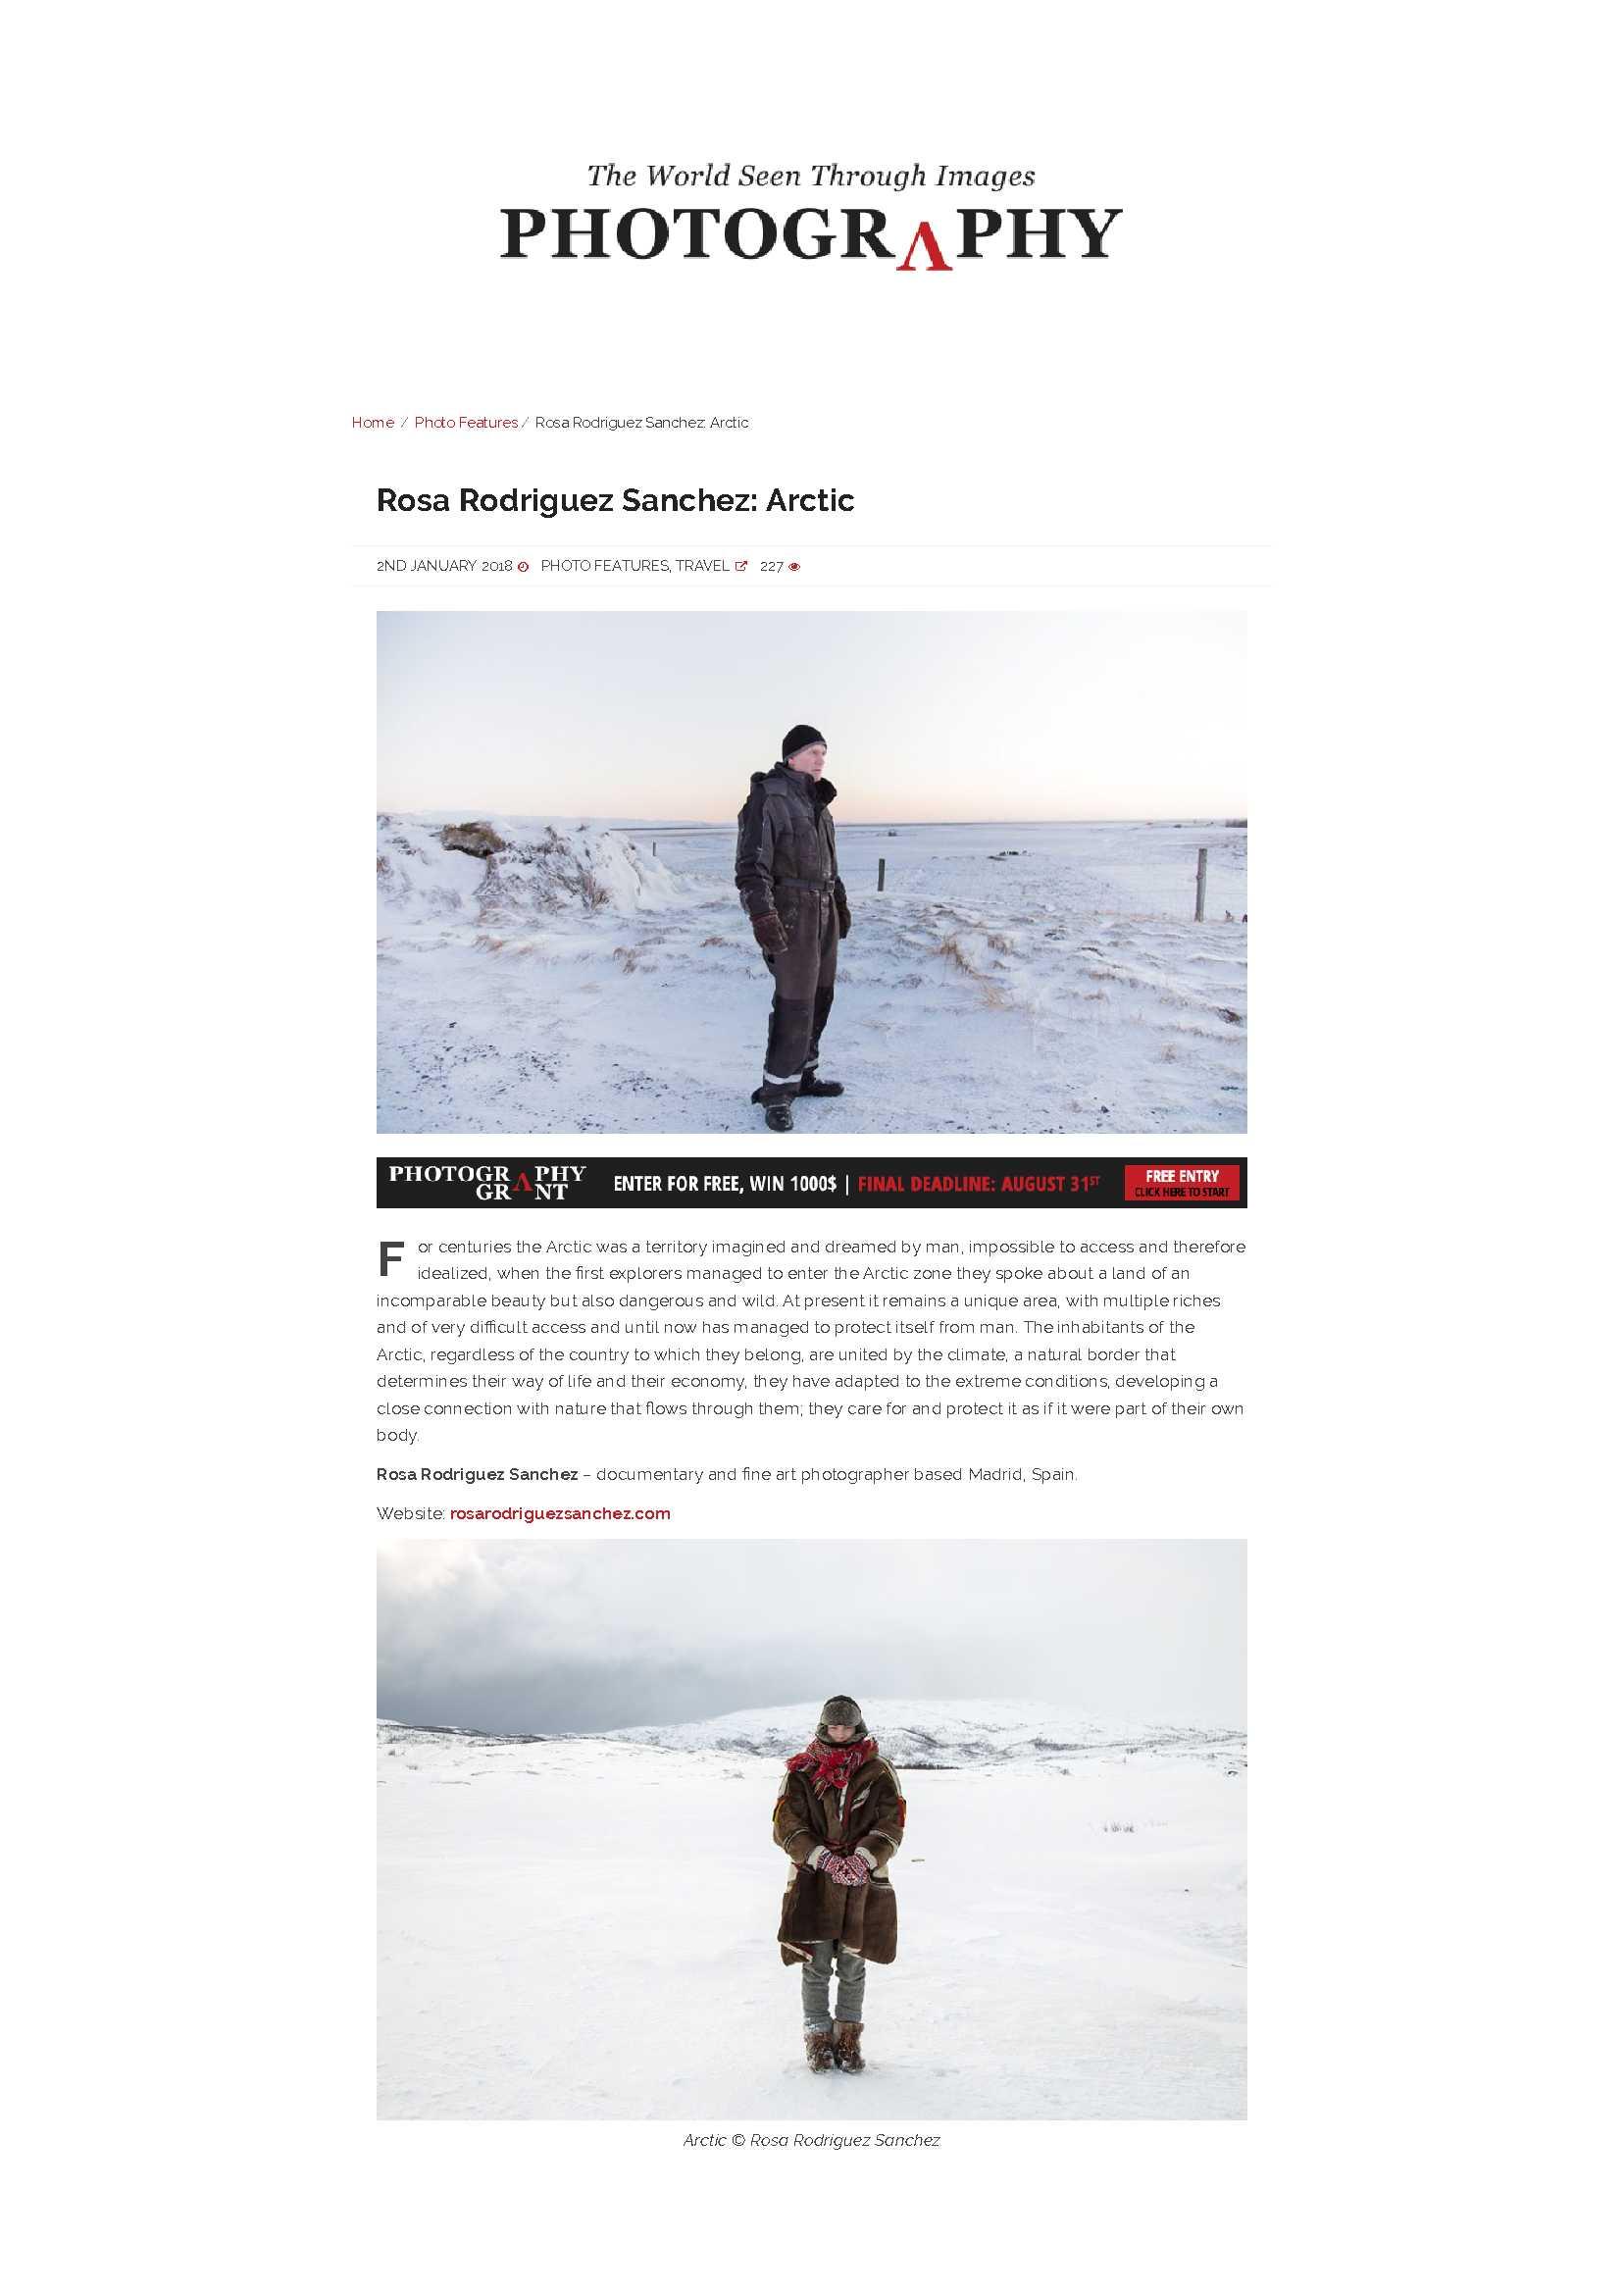 http://photogrvphy.com/rosa-rodriguez-sanchez-arctic/